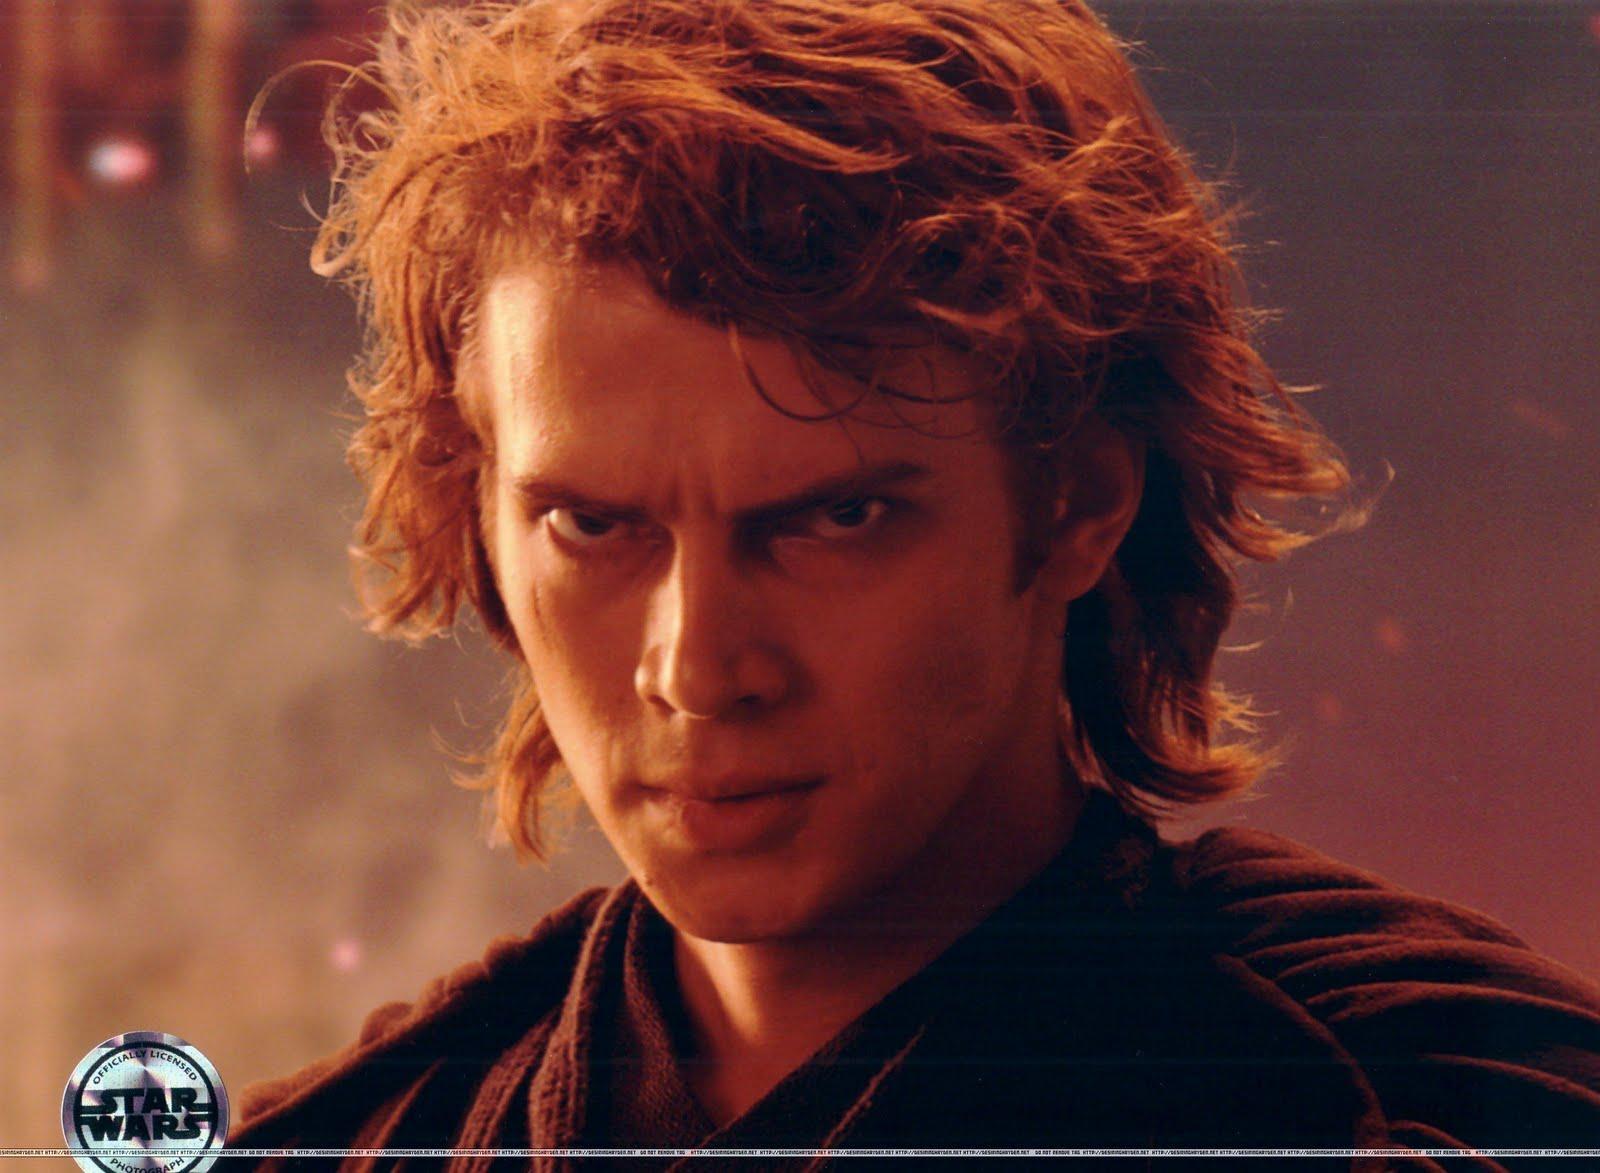 Star Wars episode 3 anakin skywalker wallpaper Picture Wallpaper 1600x1173